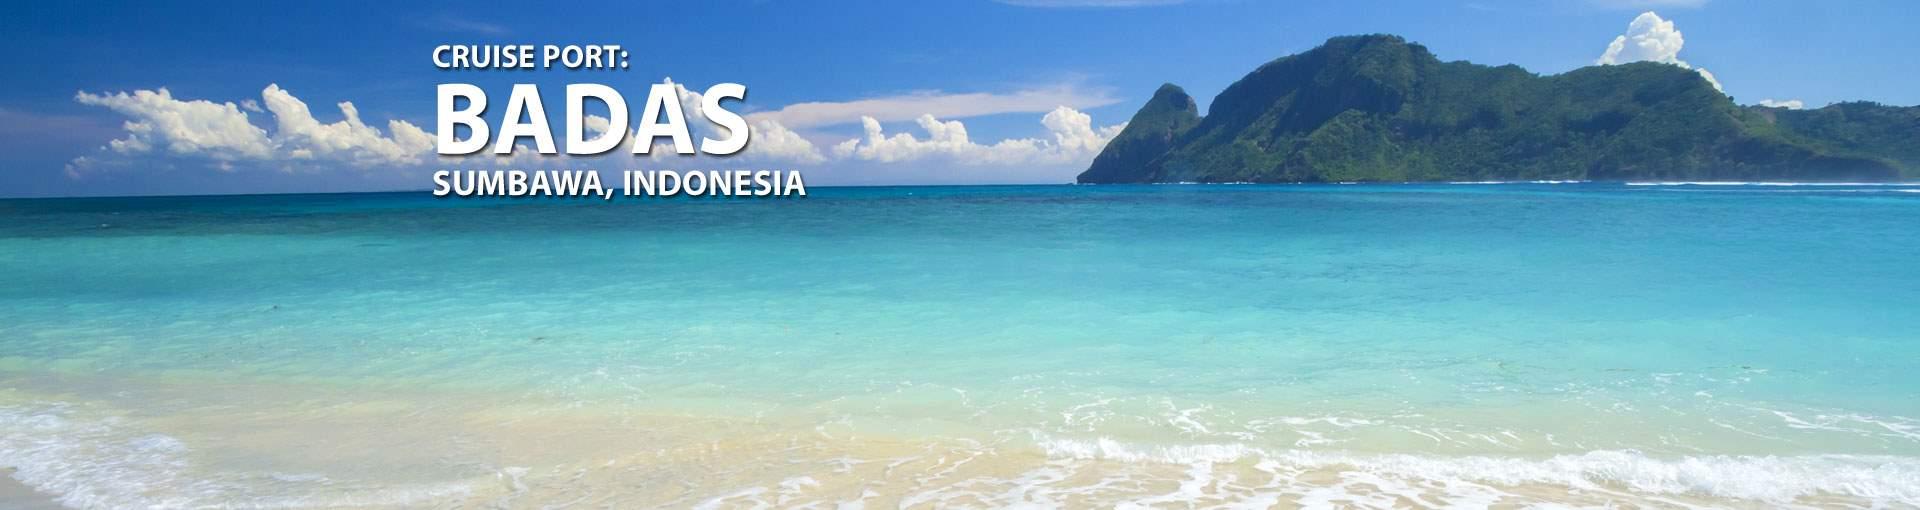 Cruises to Badas, Sumbawa, Indonesia